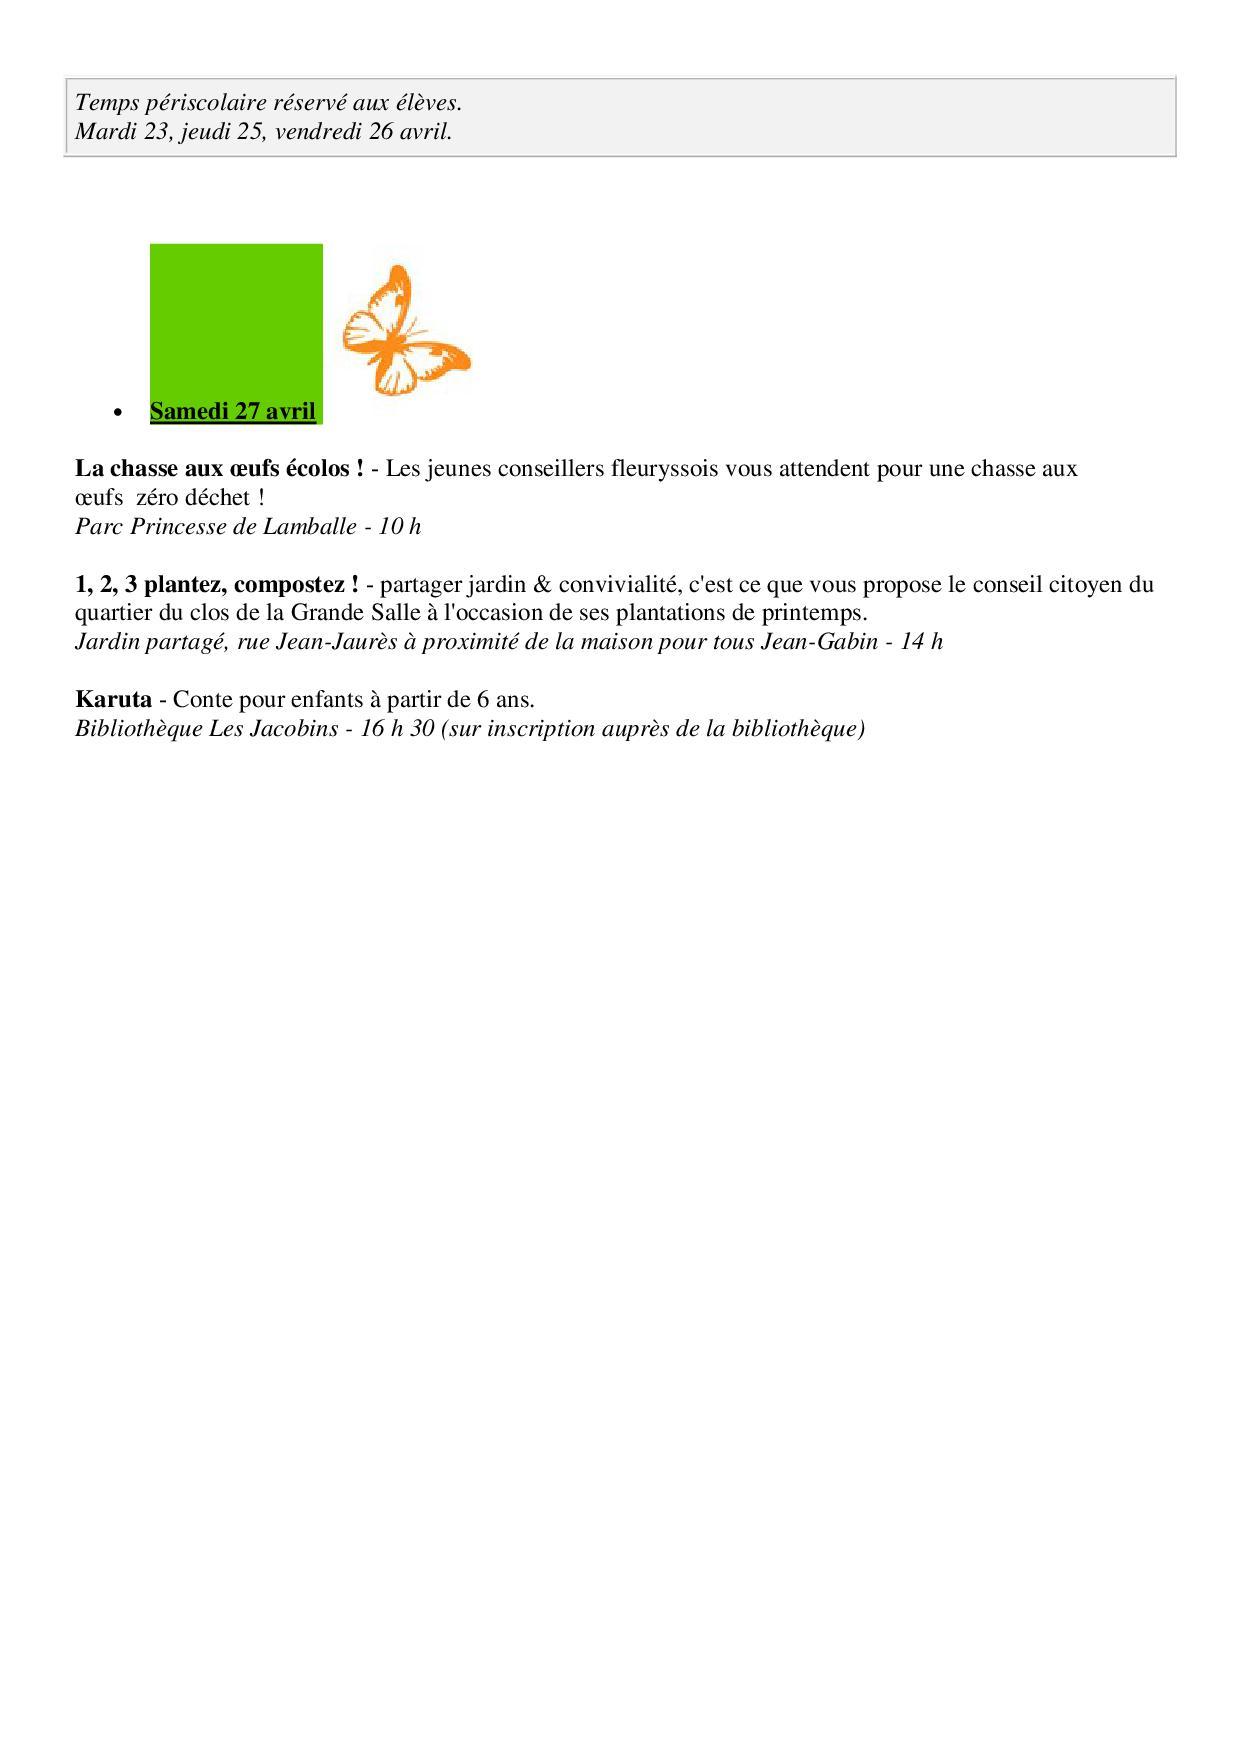 Document13.jpg